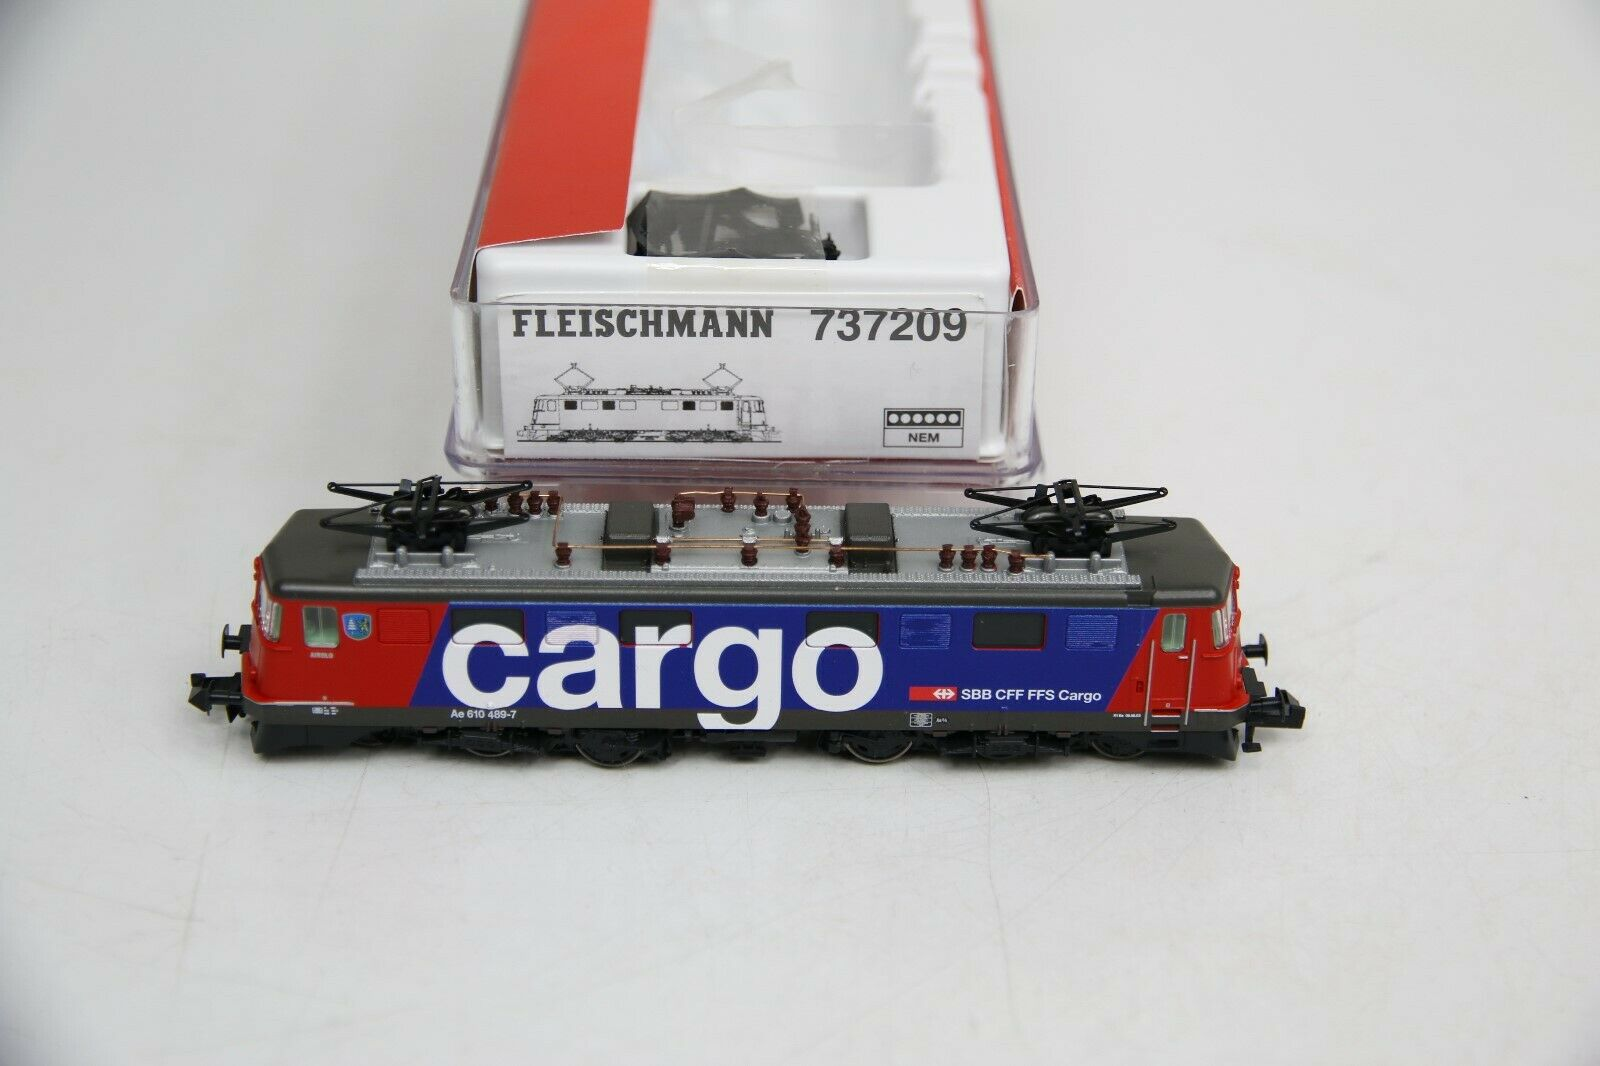 Fleischuomon Spur N 737209 ELok AE 610 4897 Airolo delle SBB autogo in scatola originale rc472